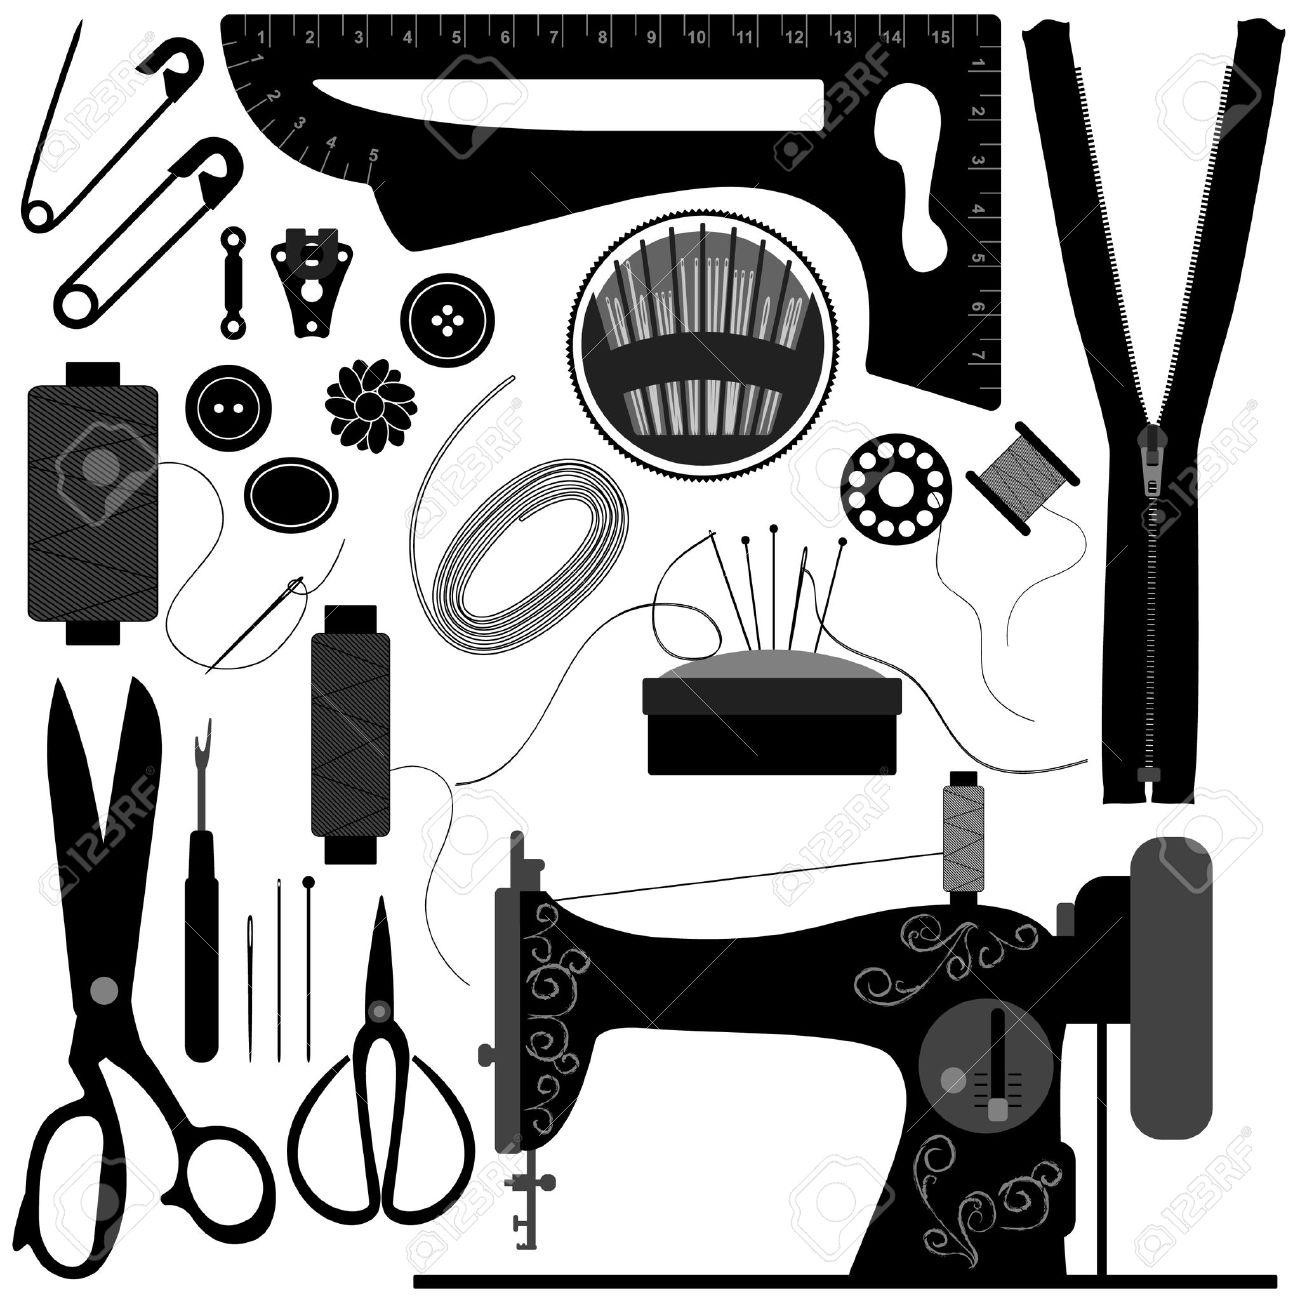 Sewing Tailor Retro Black Stock Vector - 8513562